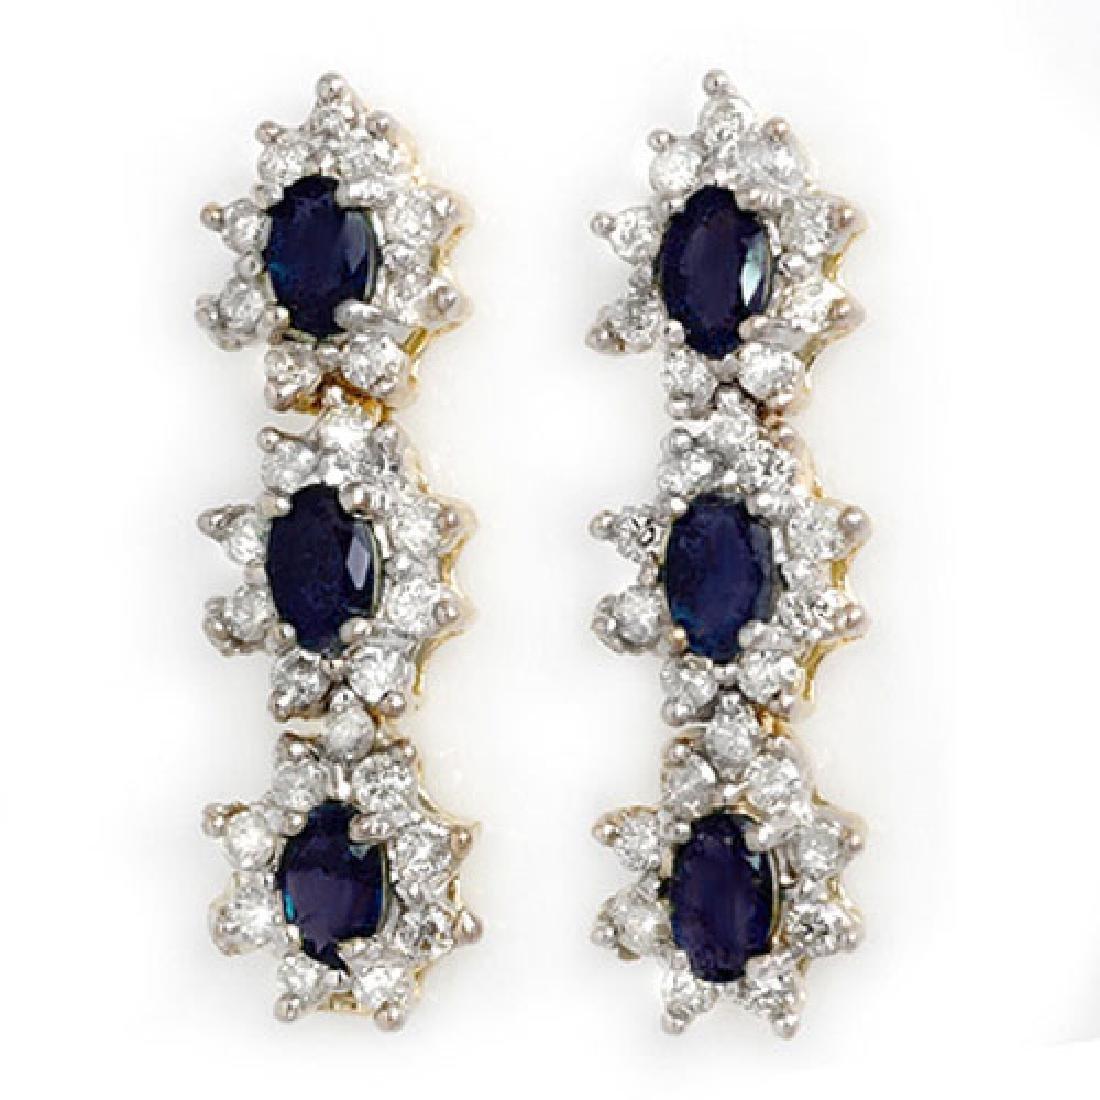 5.88 CTW Blue Sapphire & Diamond Earrings 14K Yellow